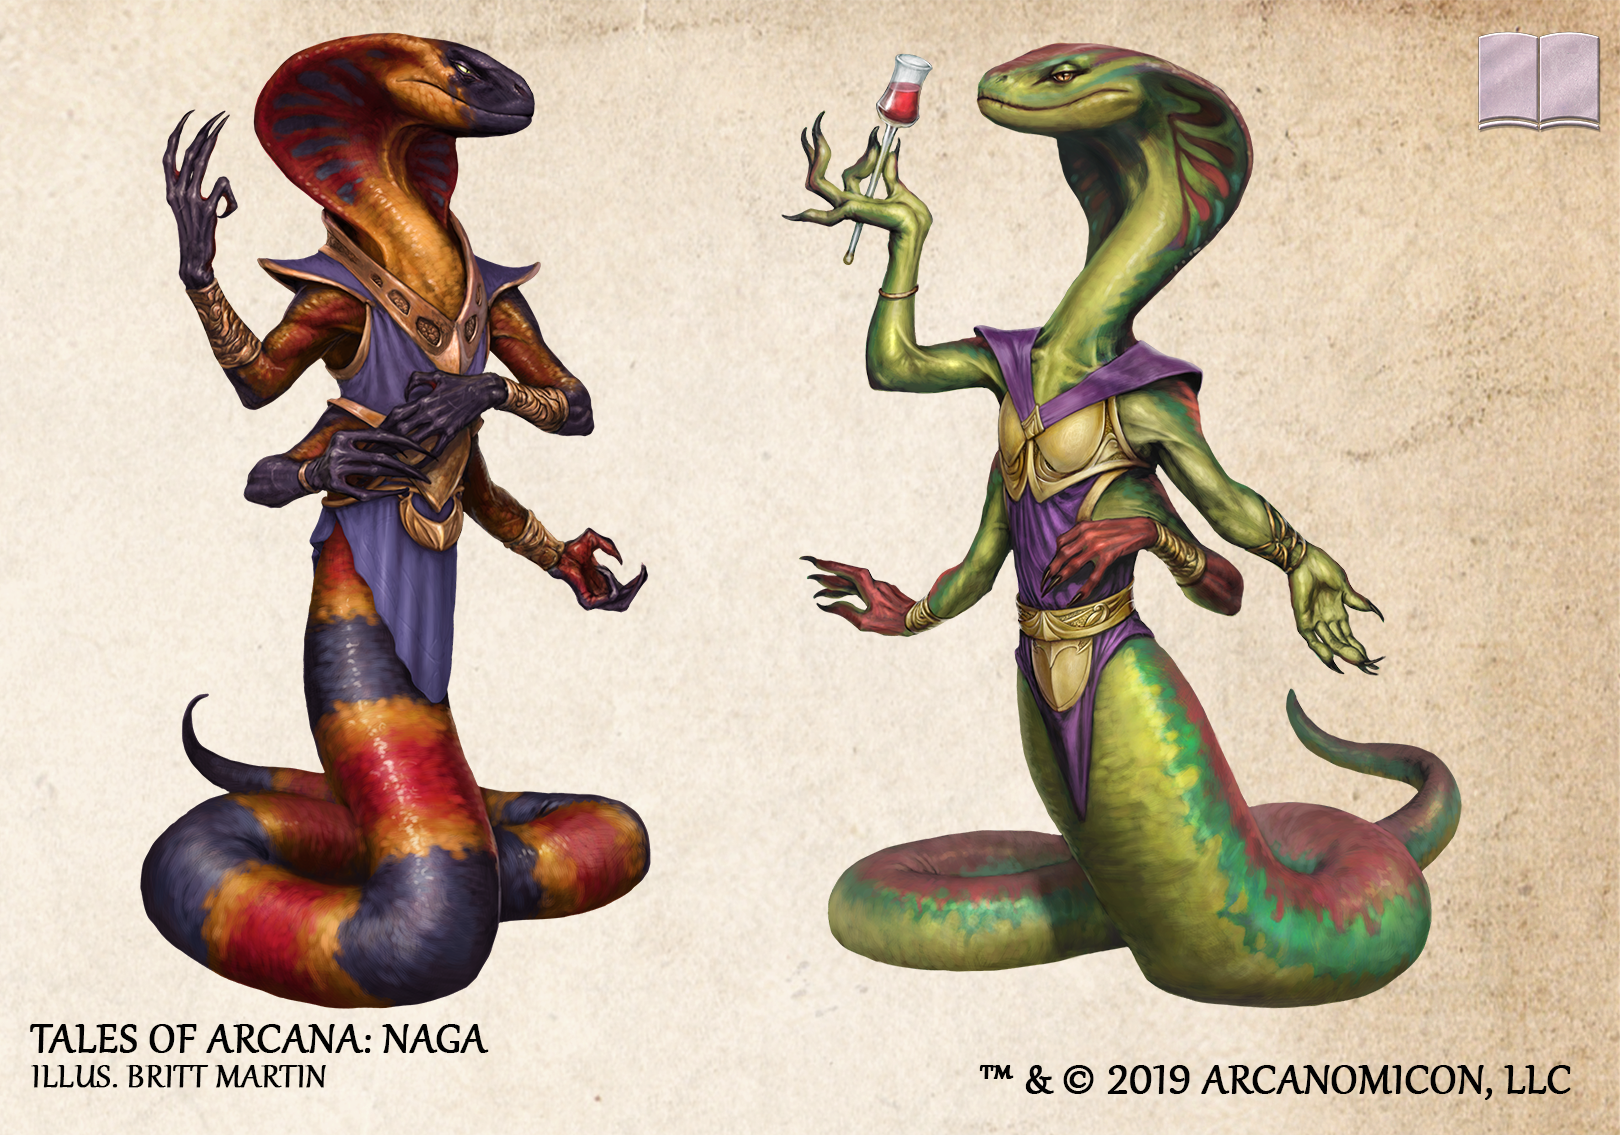 Tales Of Arcana Naga Science Fiction Art Fantasy Mythical Creature Art Character Art